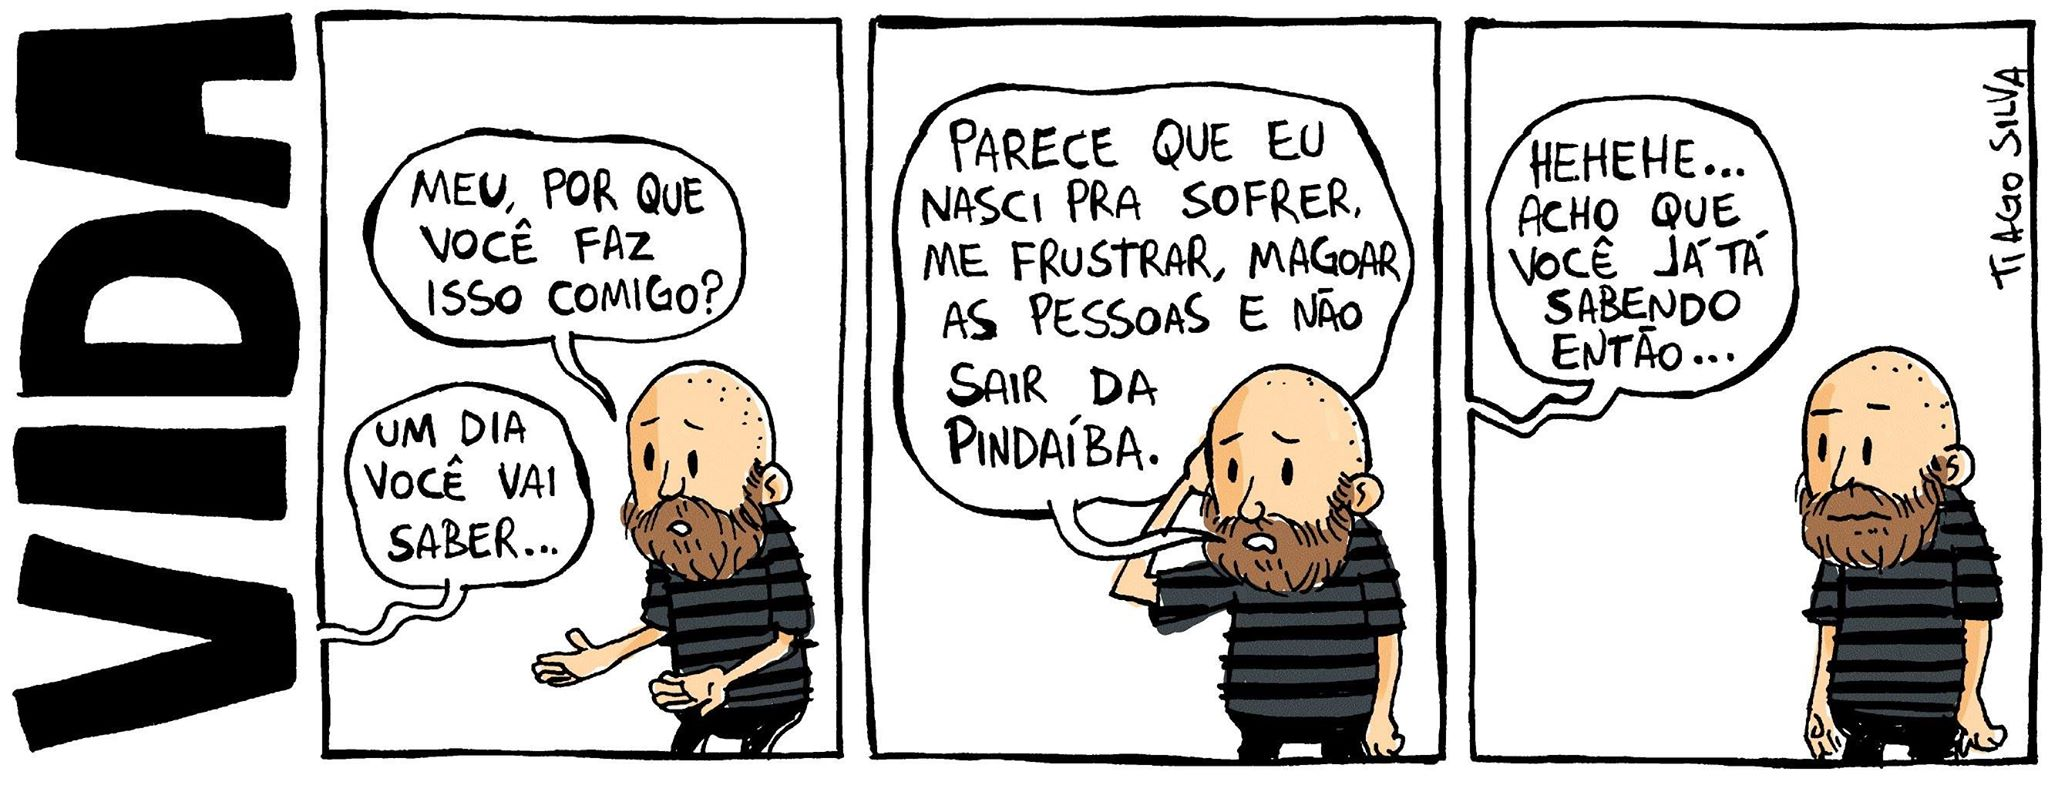 Conheca o quadrinista brasileiro Tiago Silva